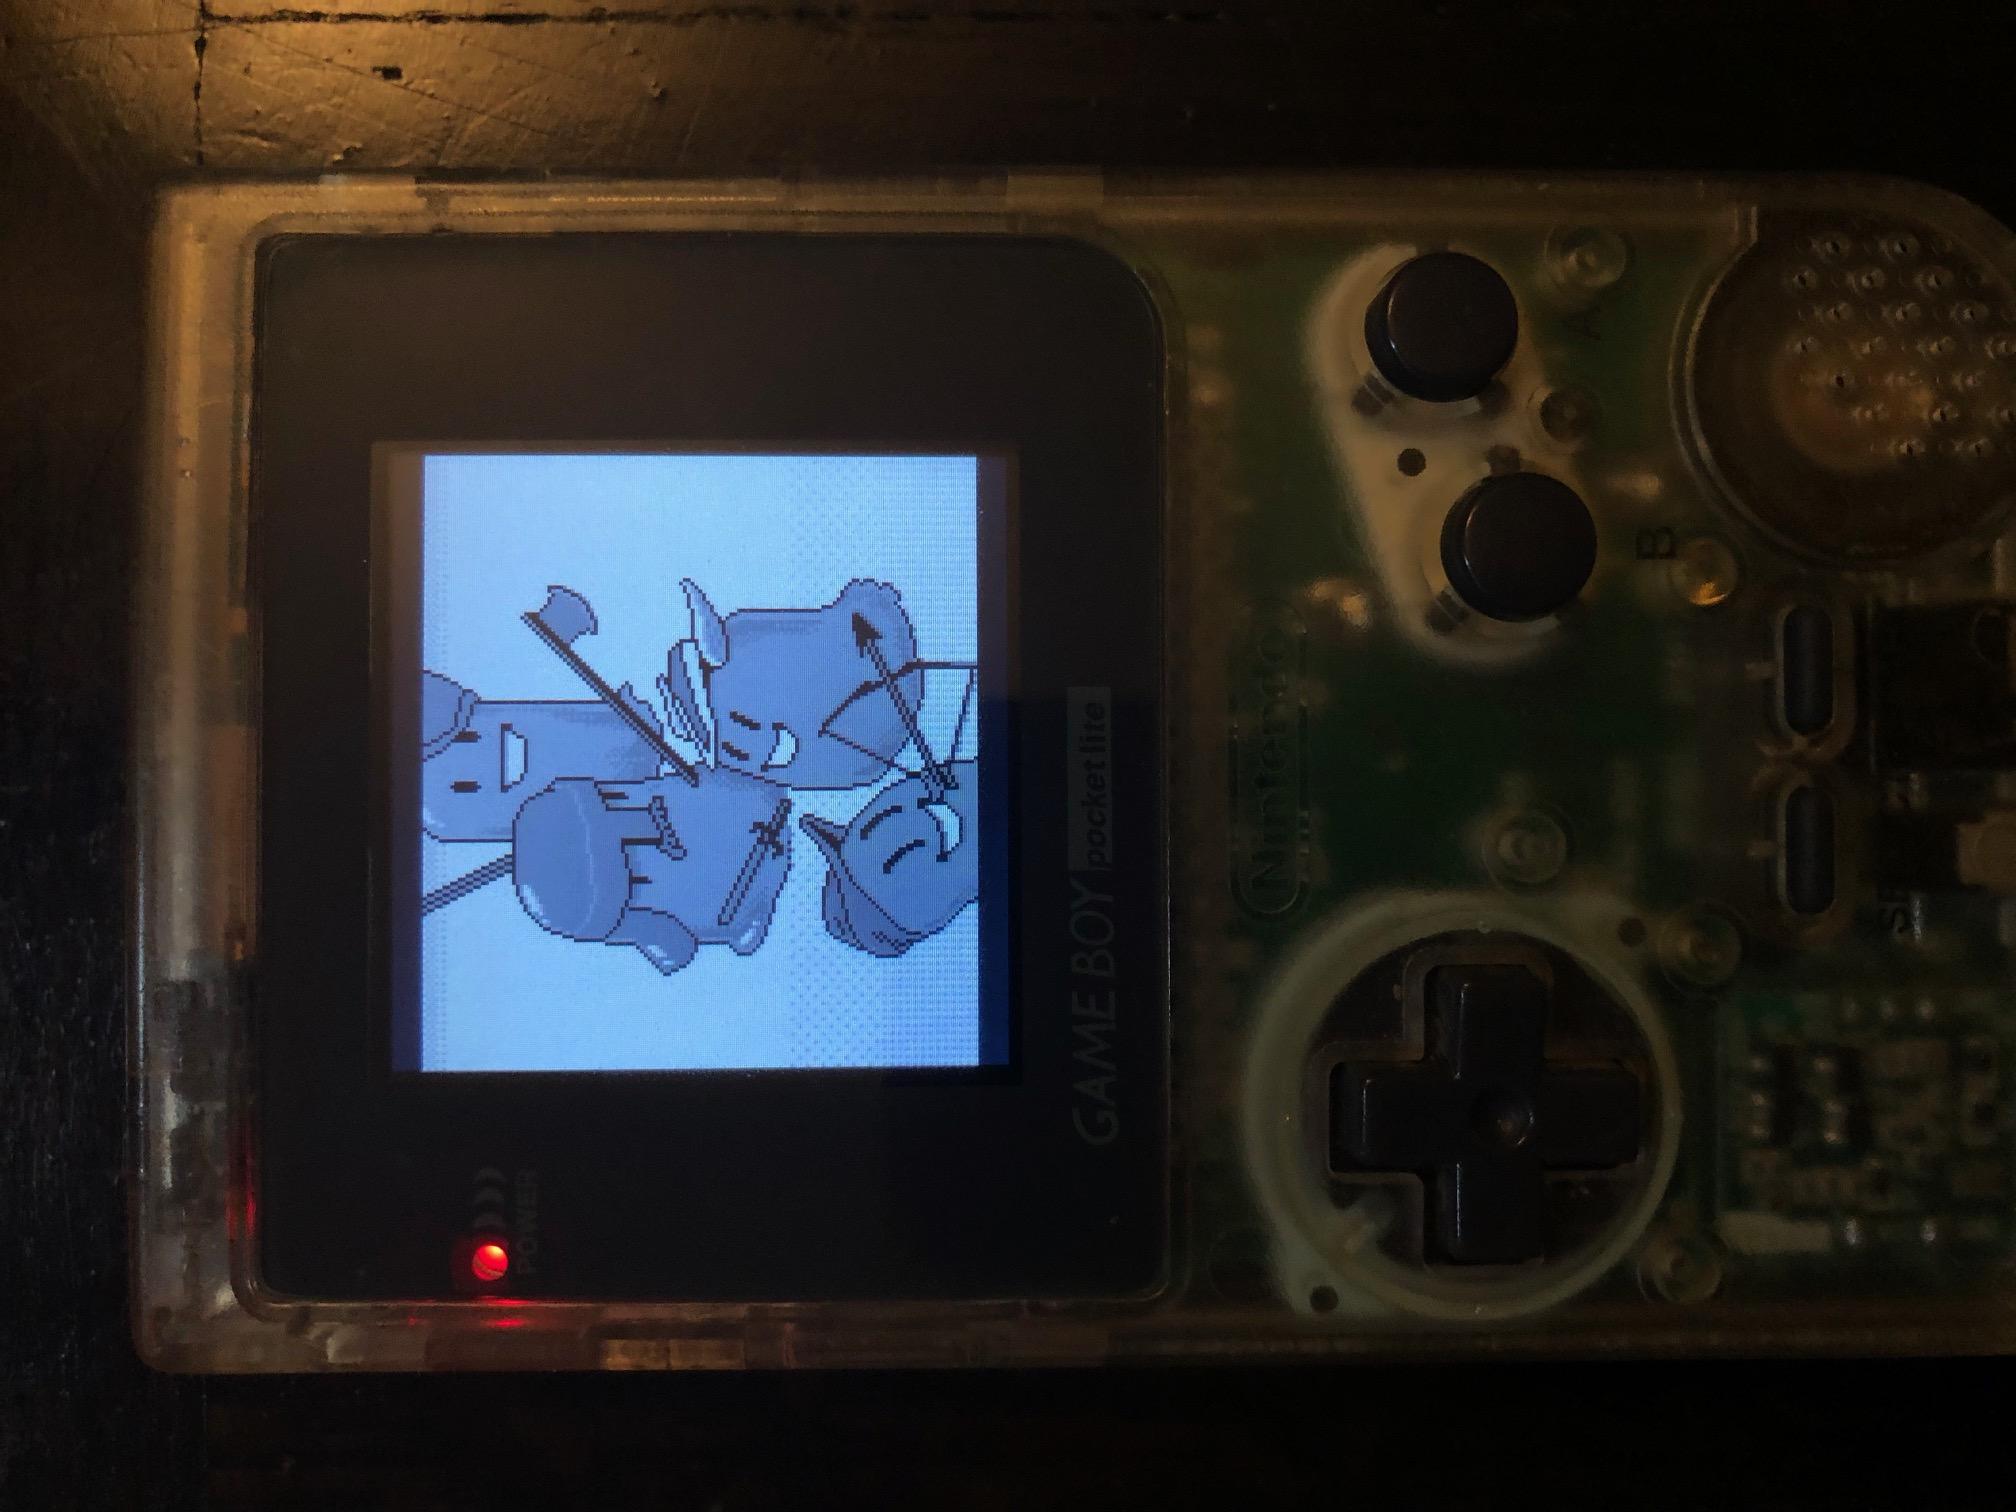 Sludge & Sorcery on a Gameboy Pocket